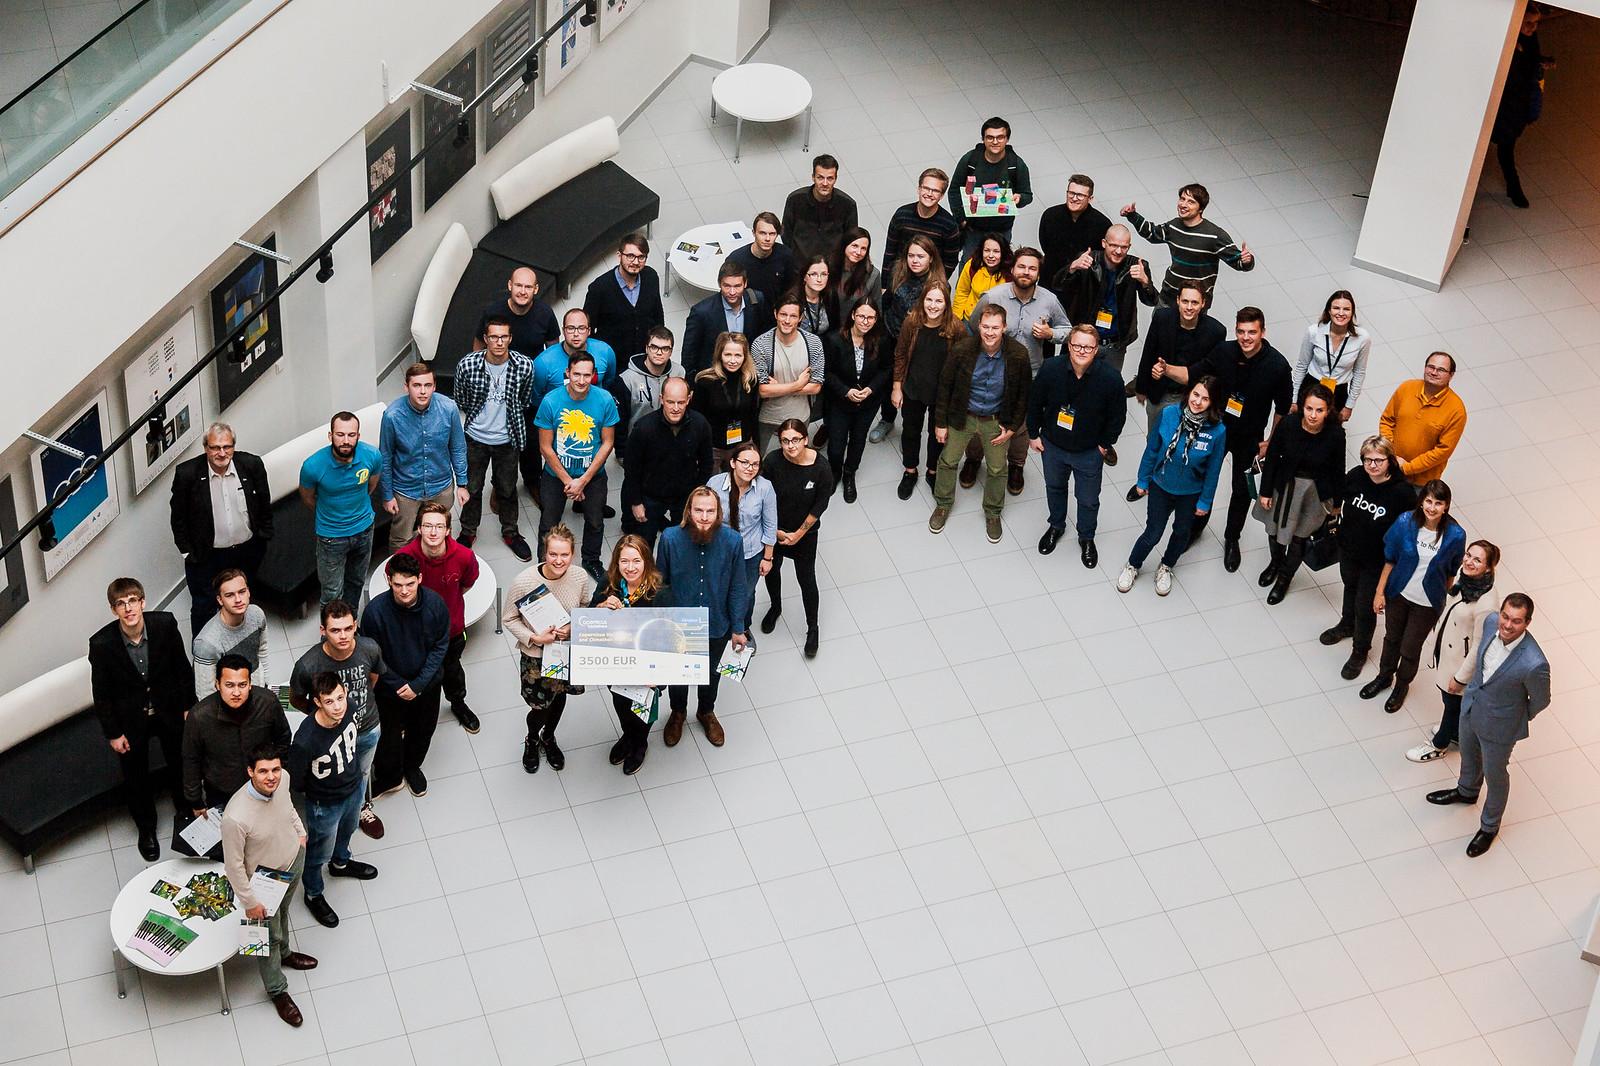 Hakatons «Copernicus Hackathon and Climathon Riga 2018»